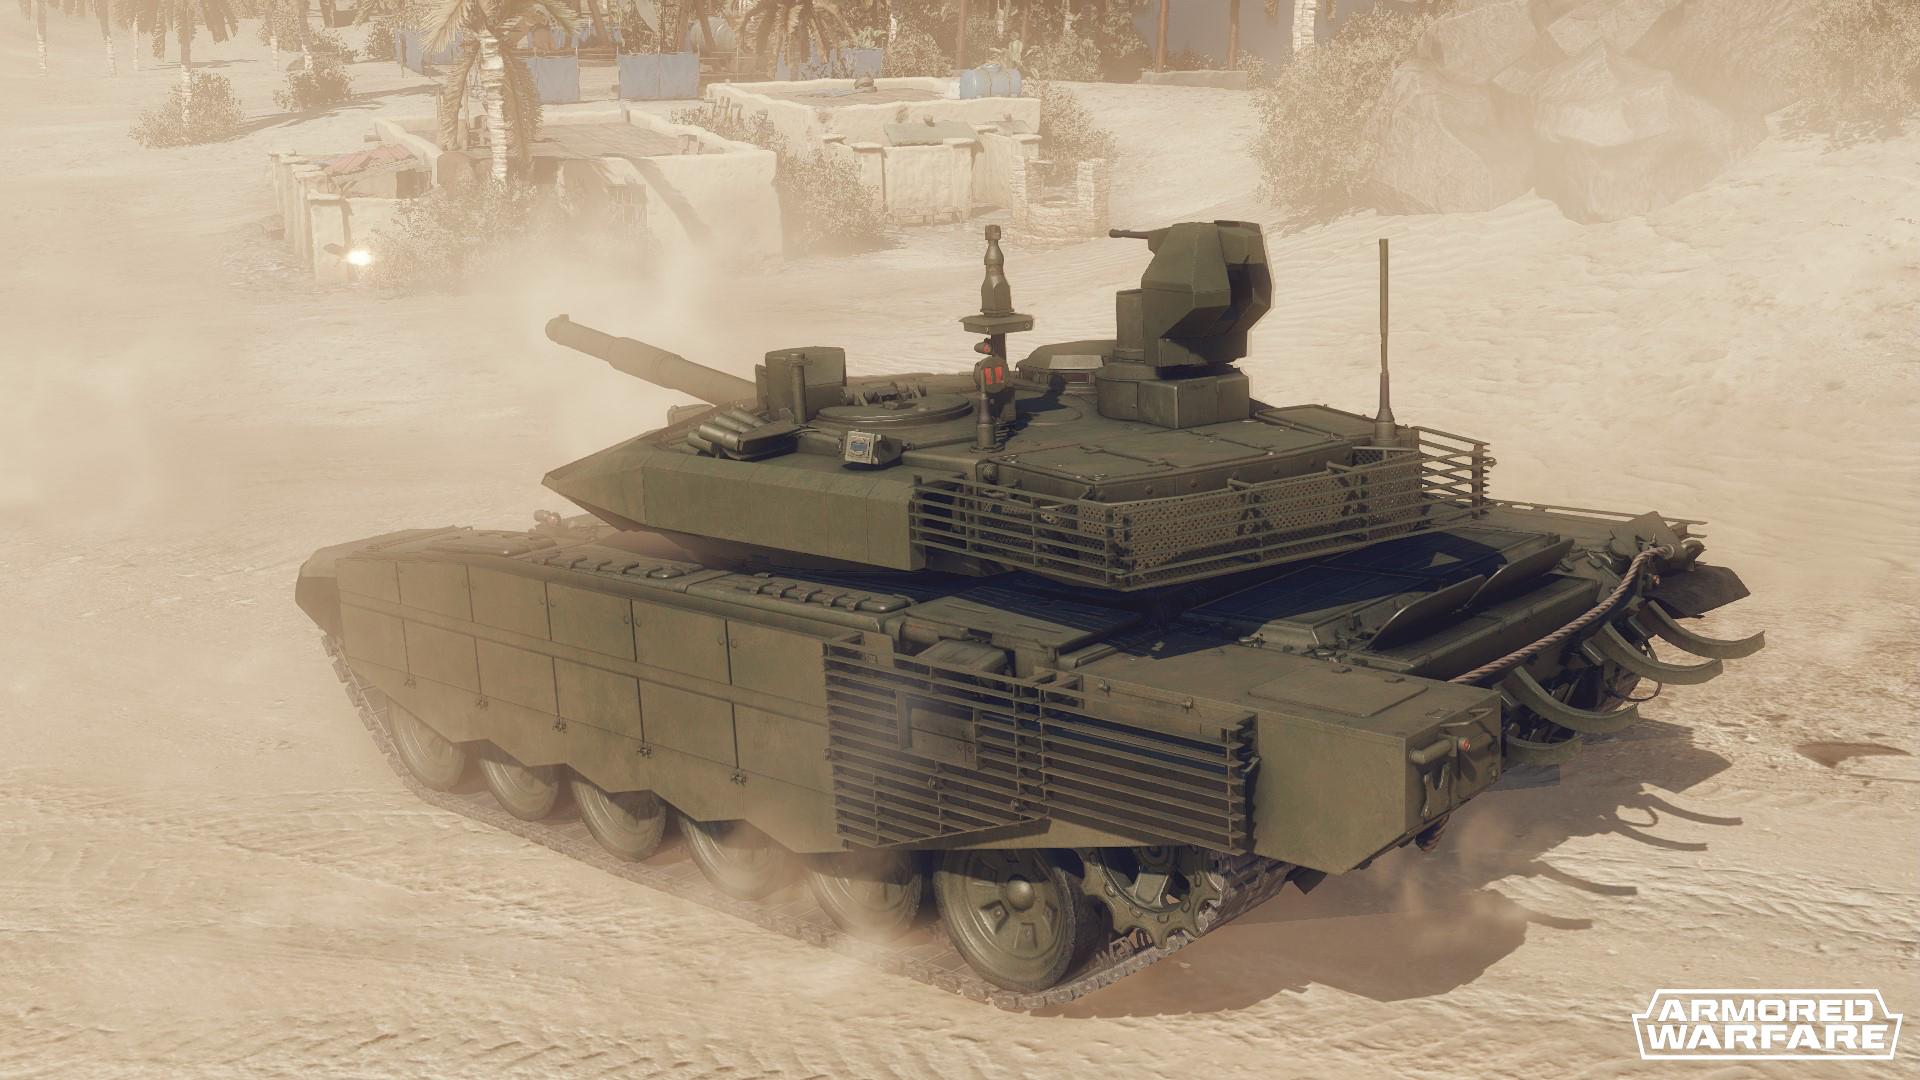 AW_Tier9_T-90MC_002